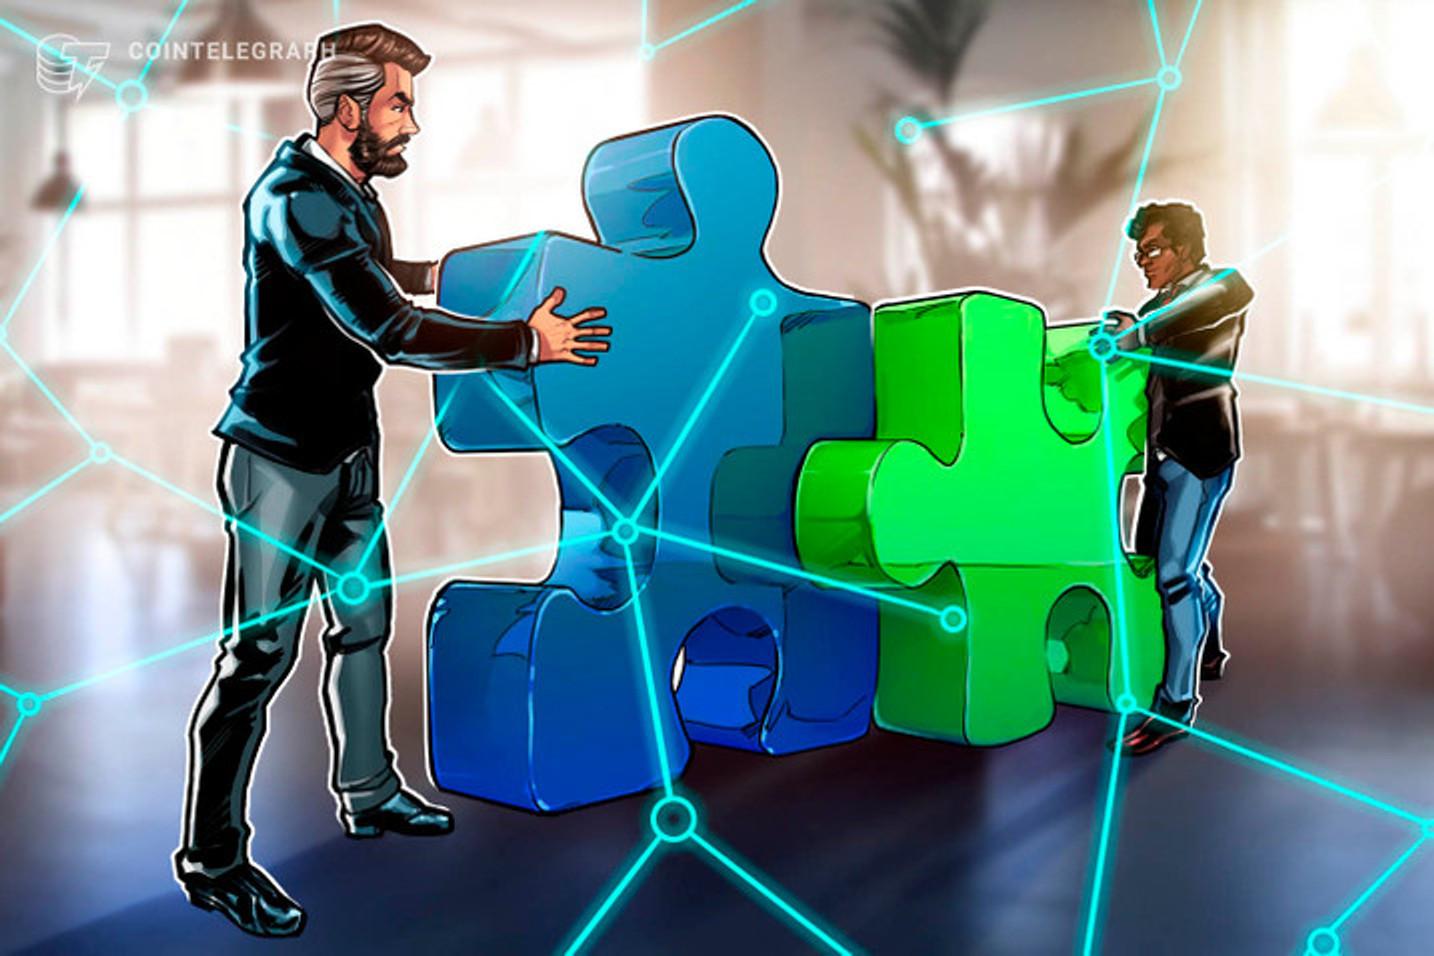 Finnovating lanza oficialmente una plataforma B2B para interconectar empresas fintech, insurtech y proptech